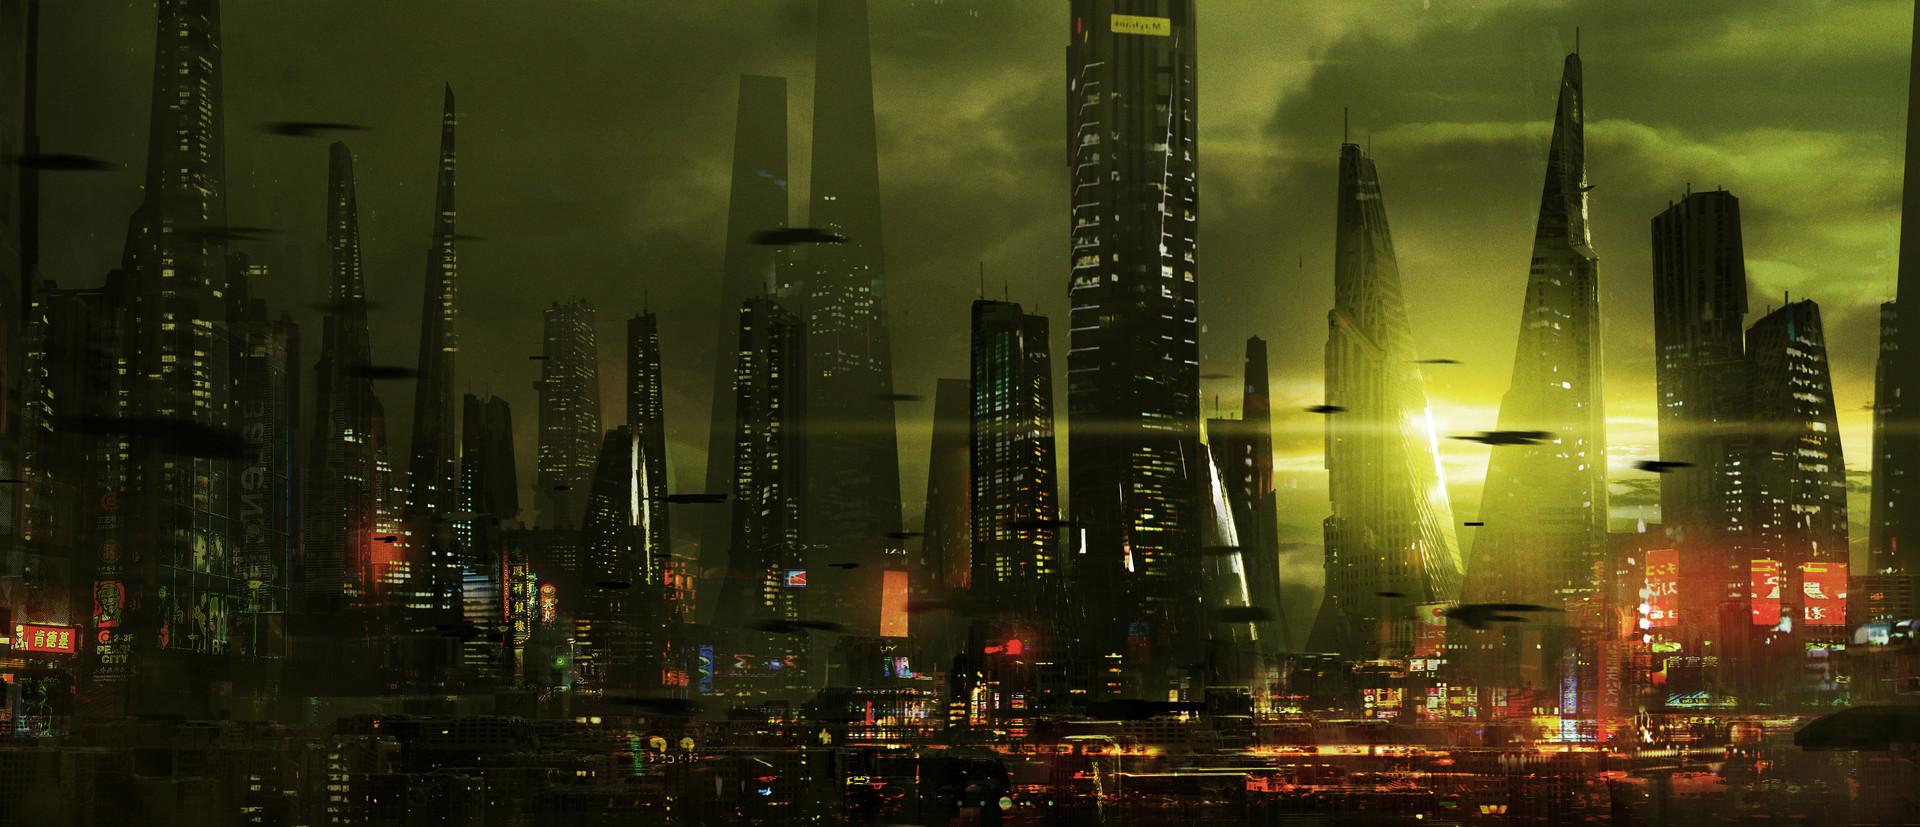 Duncan halleck scifi city